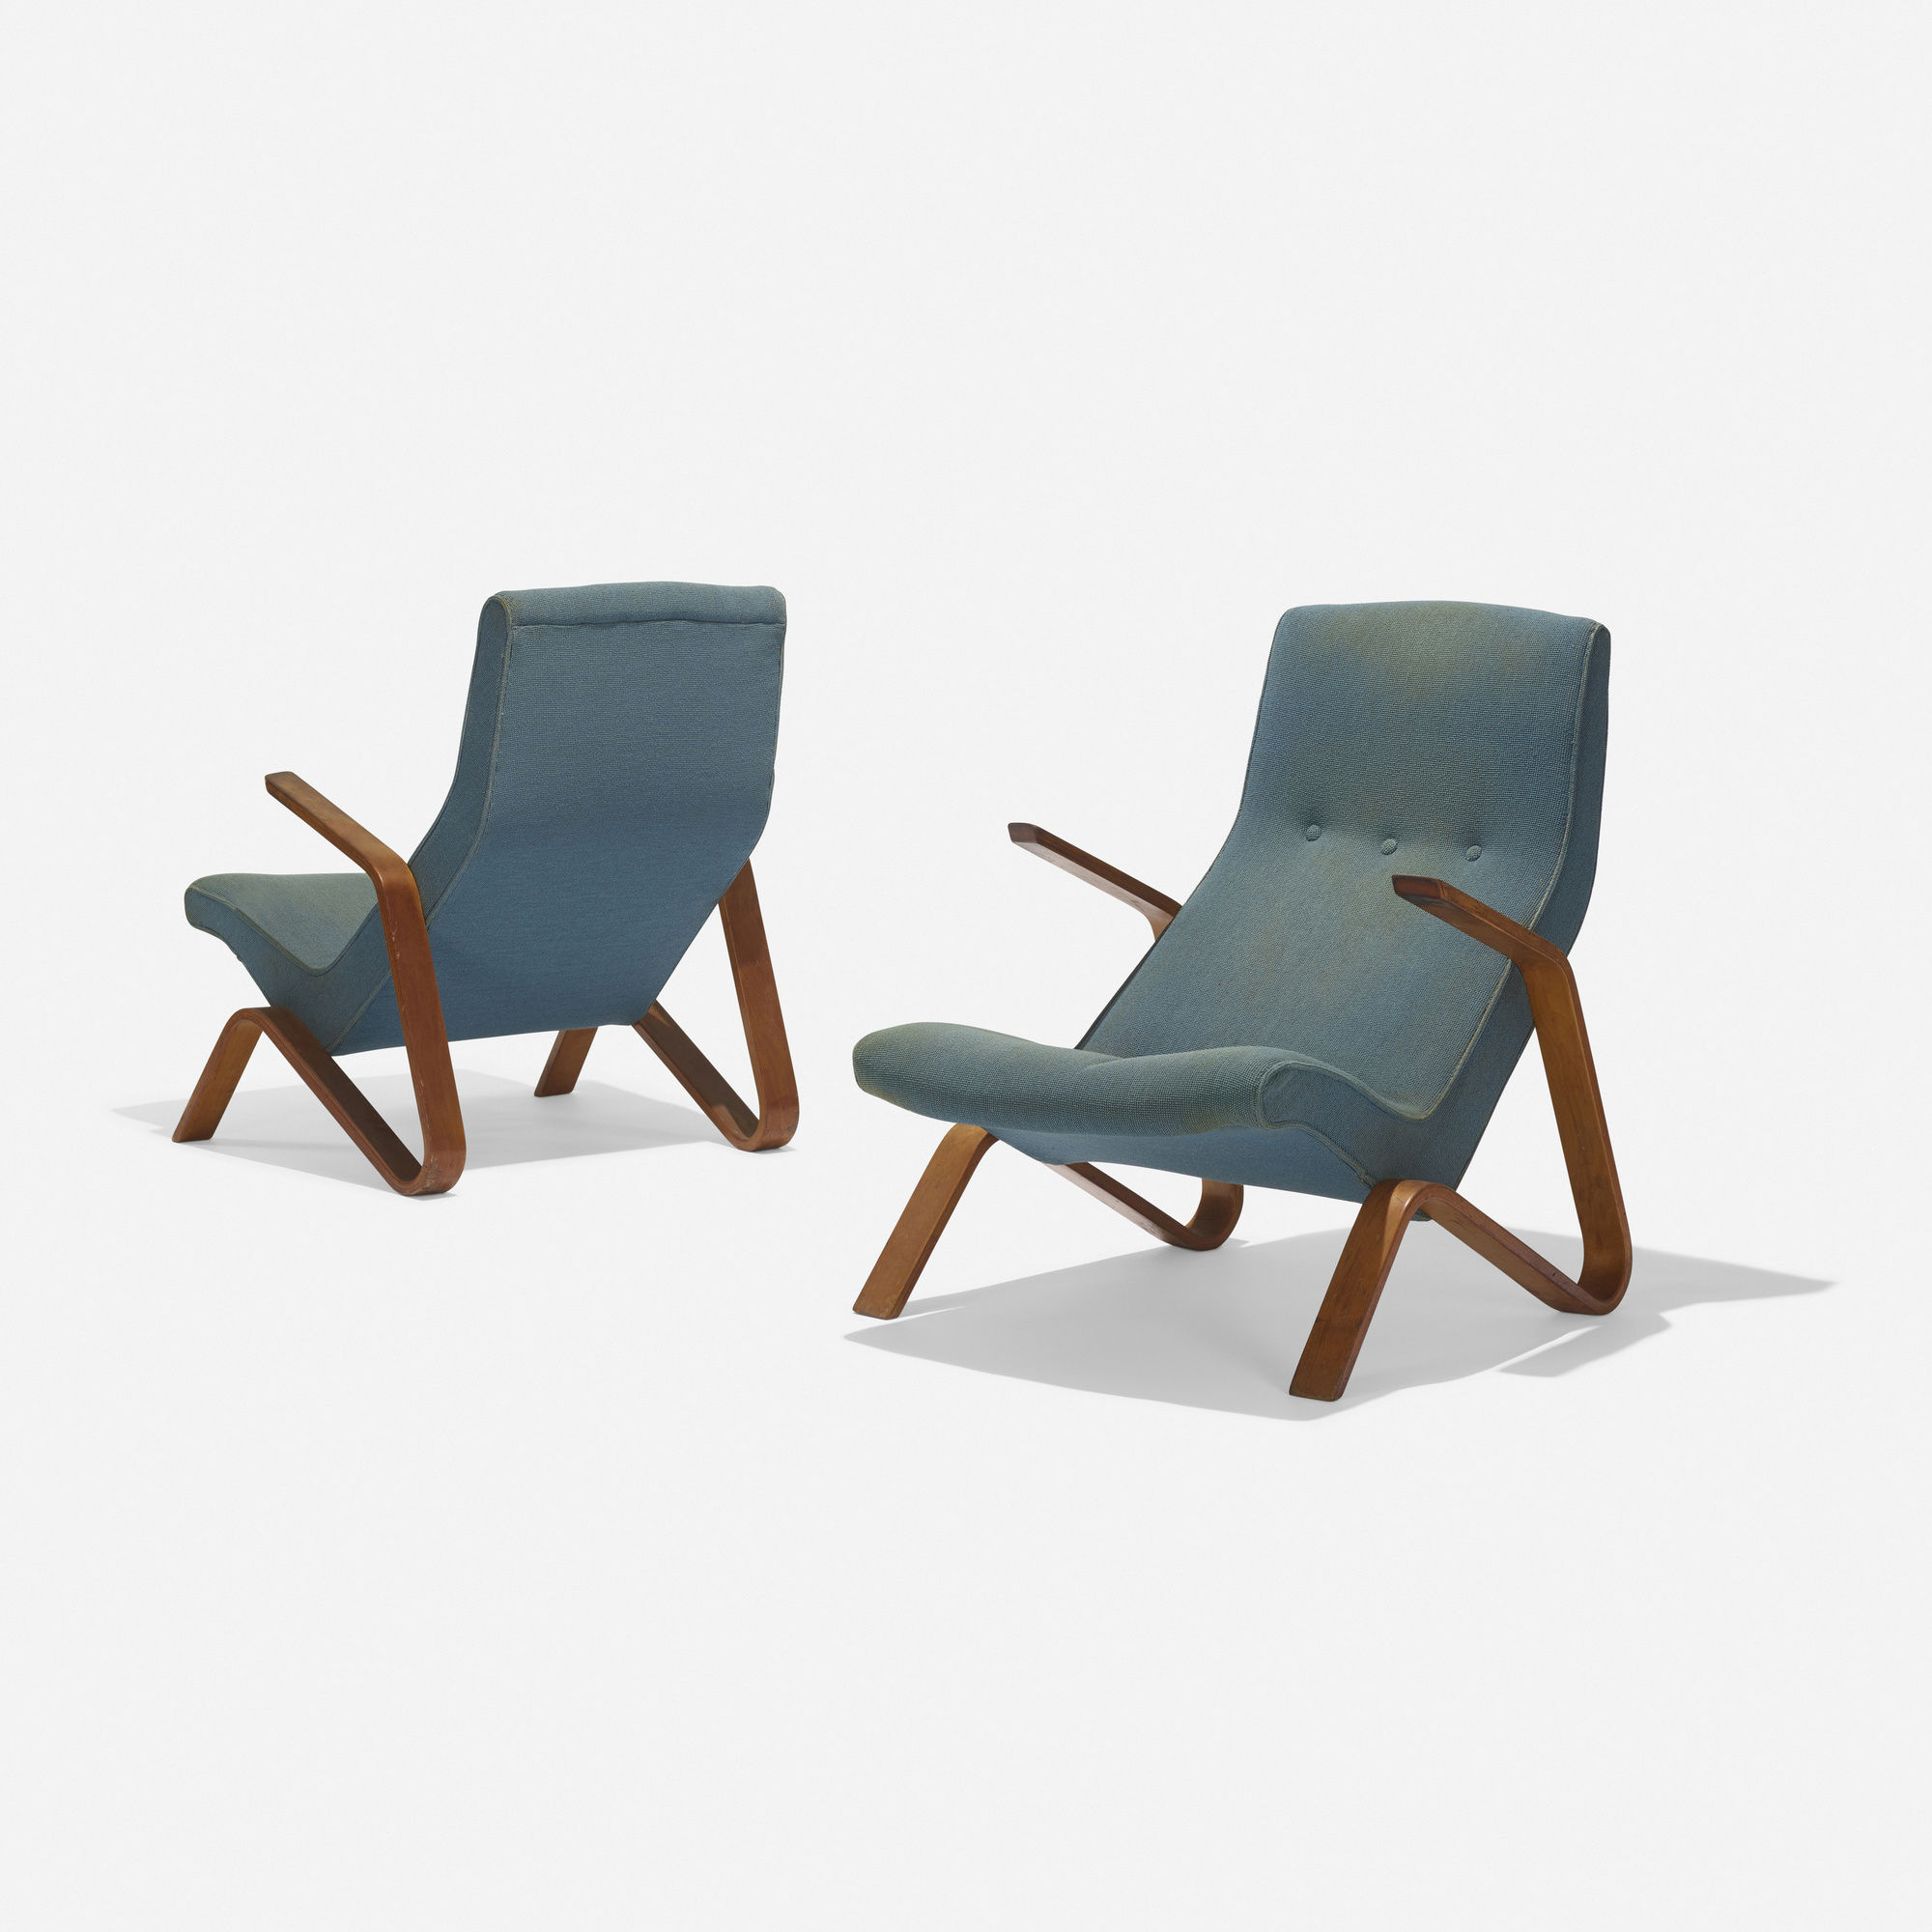 ... 121: Eero Saarinen / Grasshopper Chairs, Pair (2 Of 3)